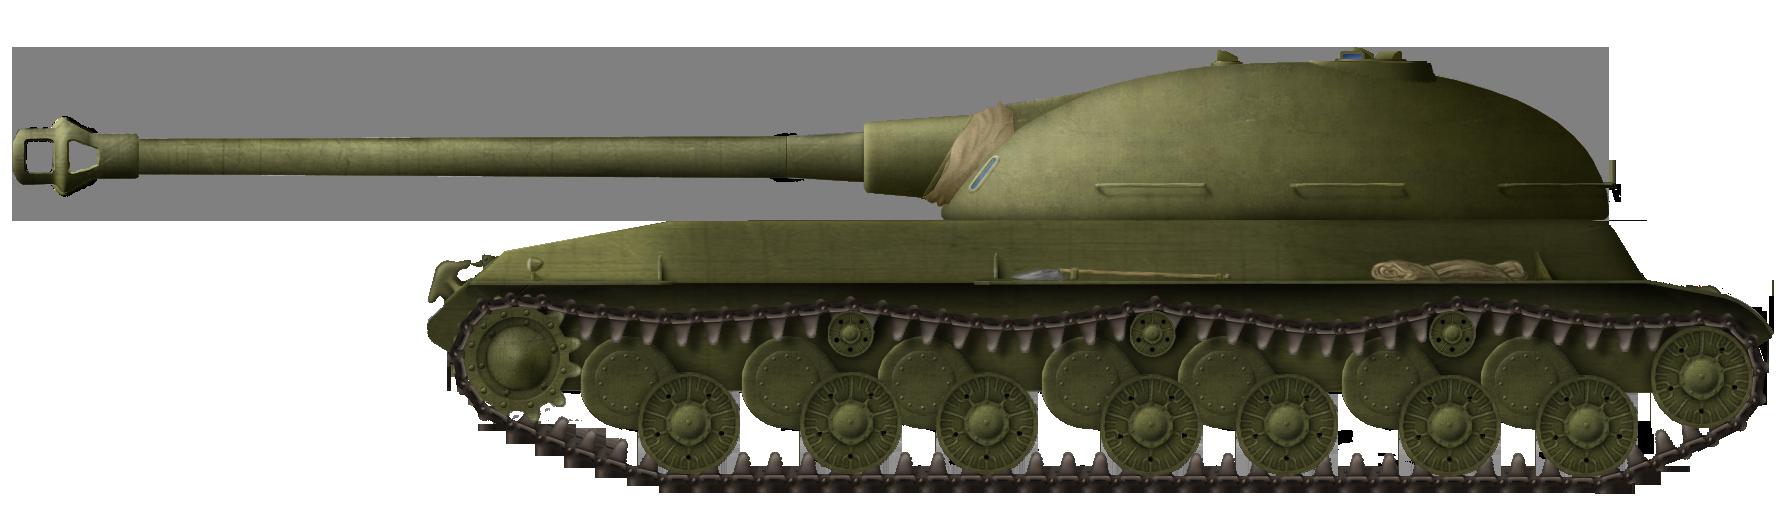 Gremyakin's Medium Tank (STG)